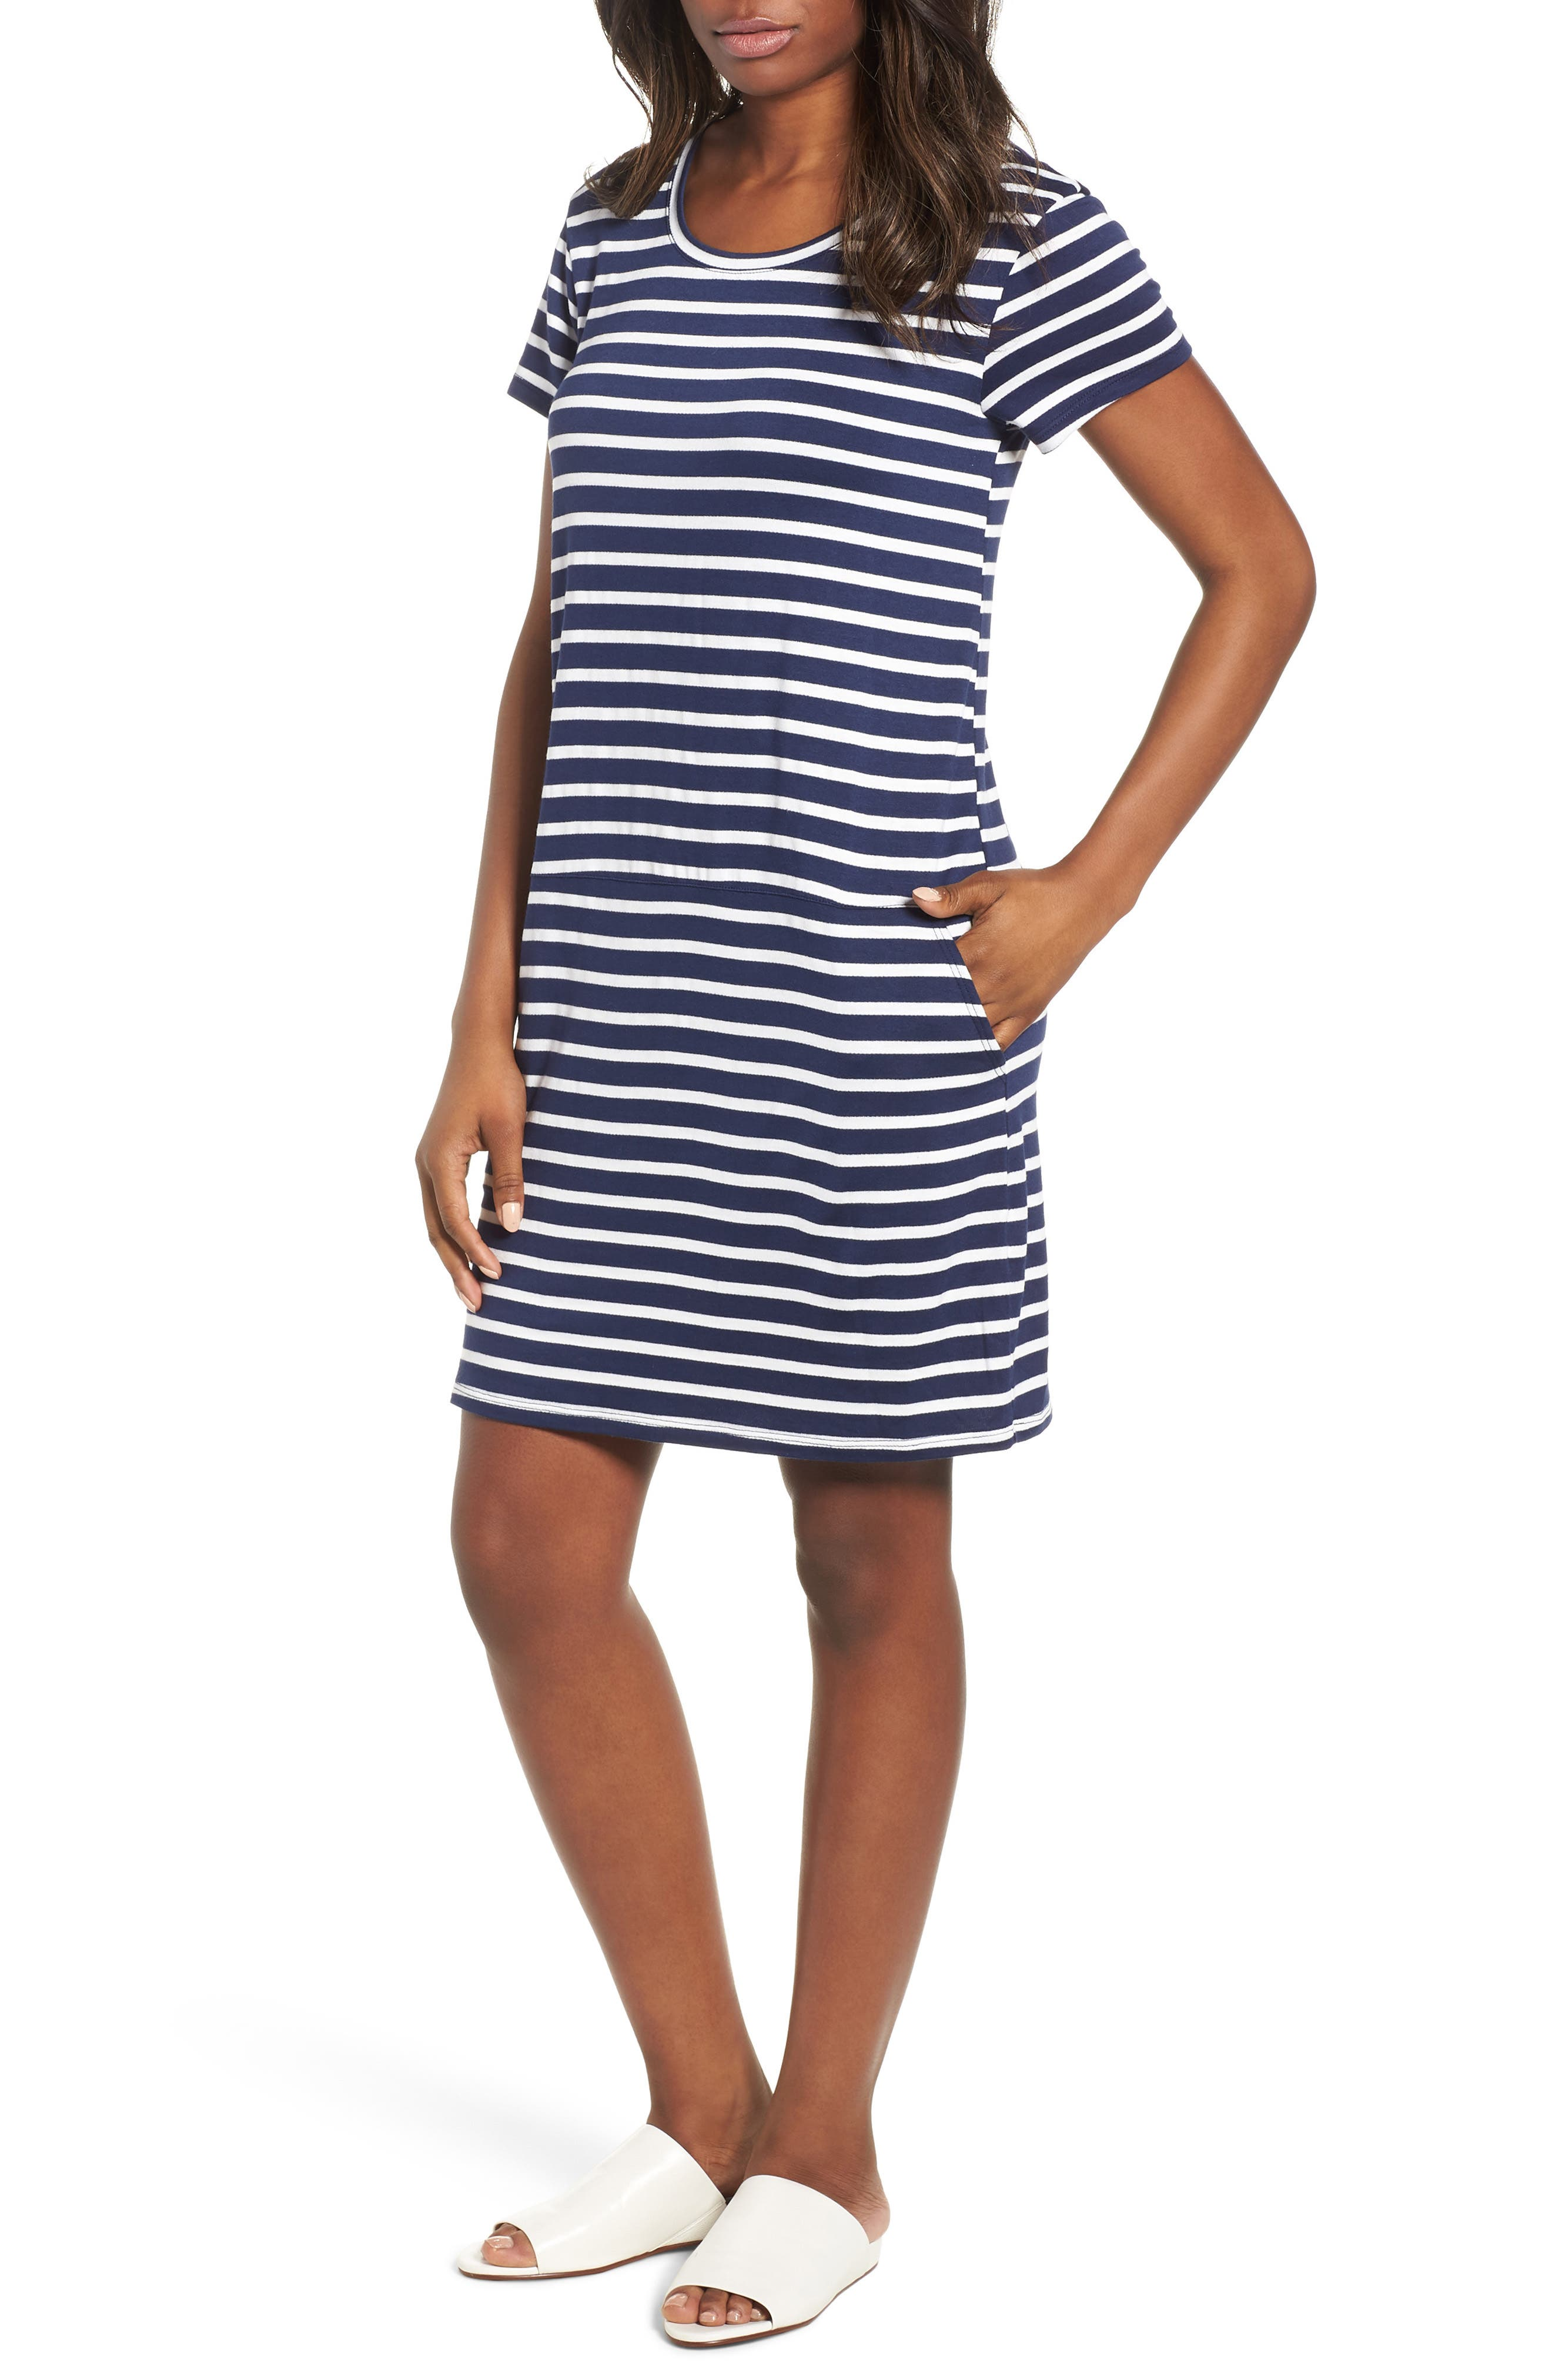 5d840cb0da6 Women s Short Sleeve Dresses